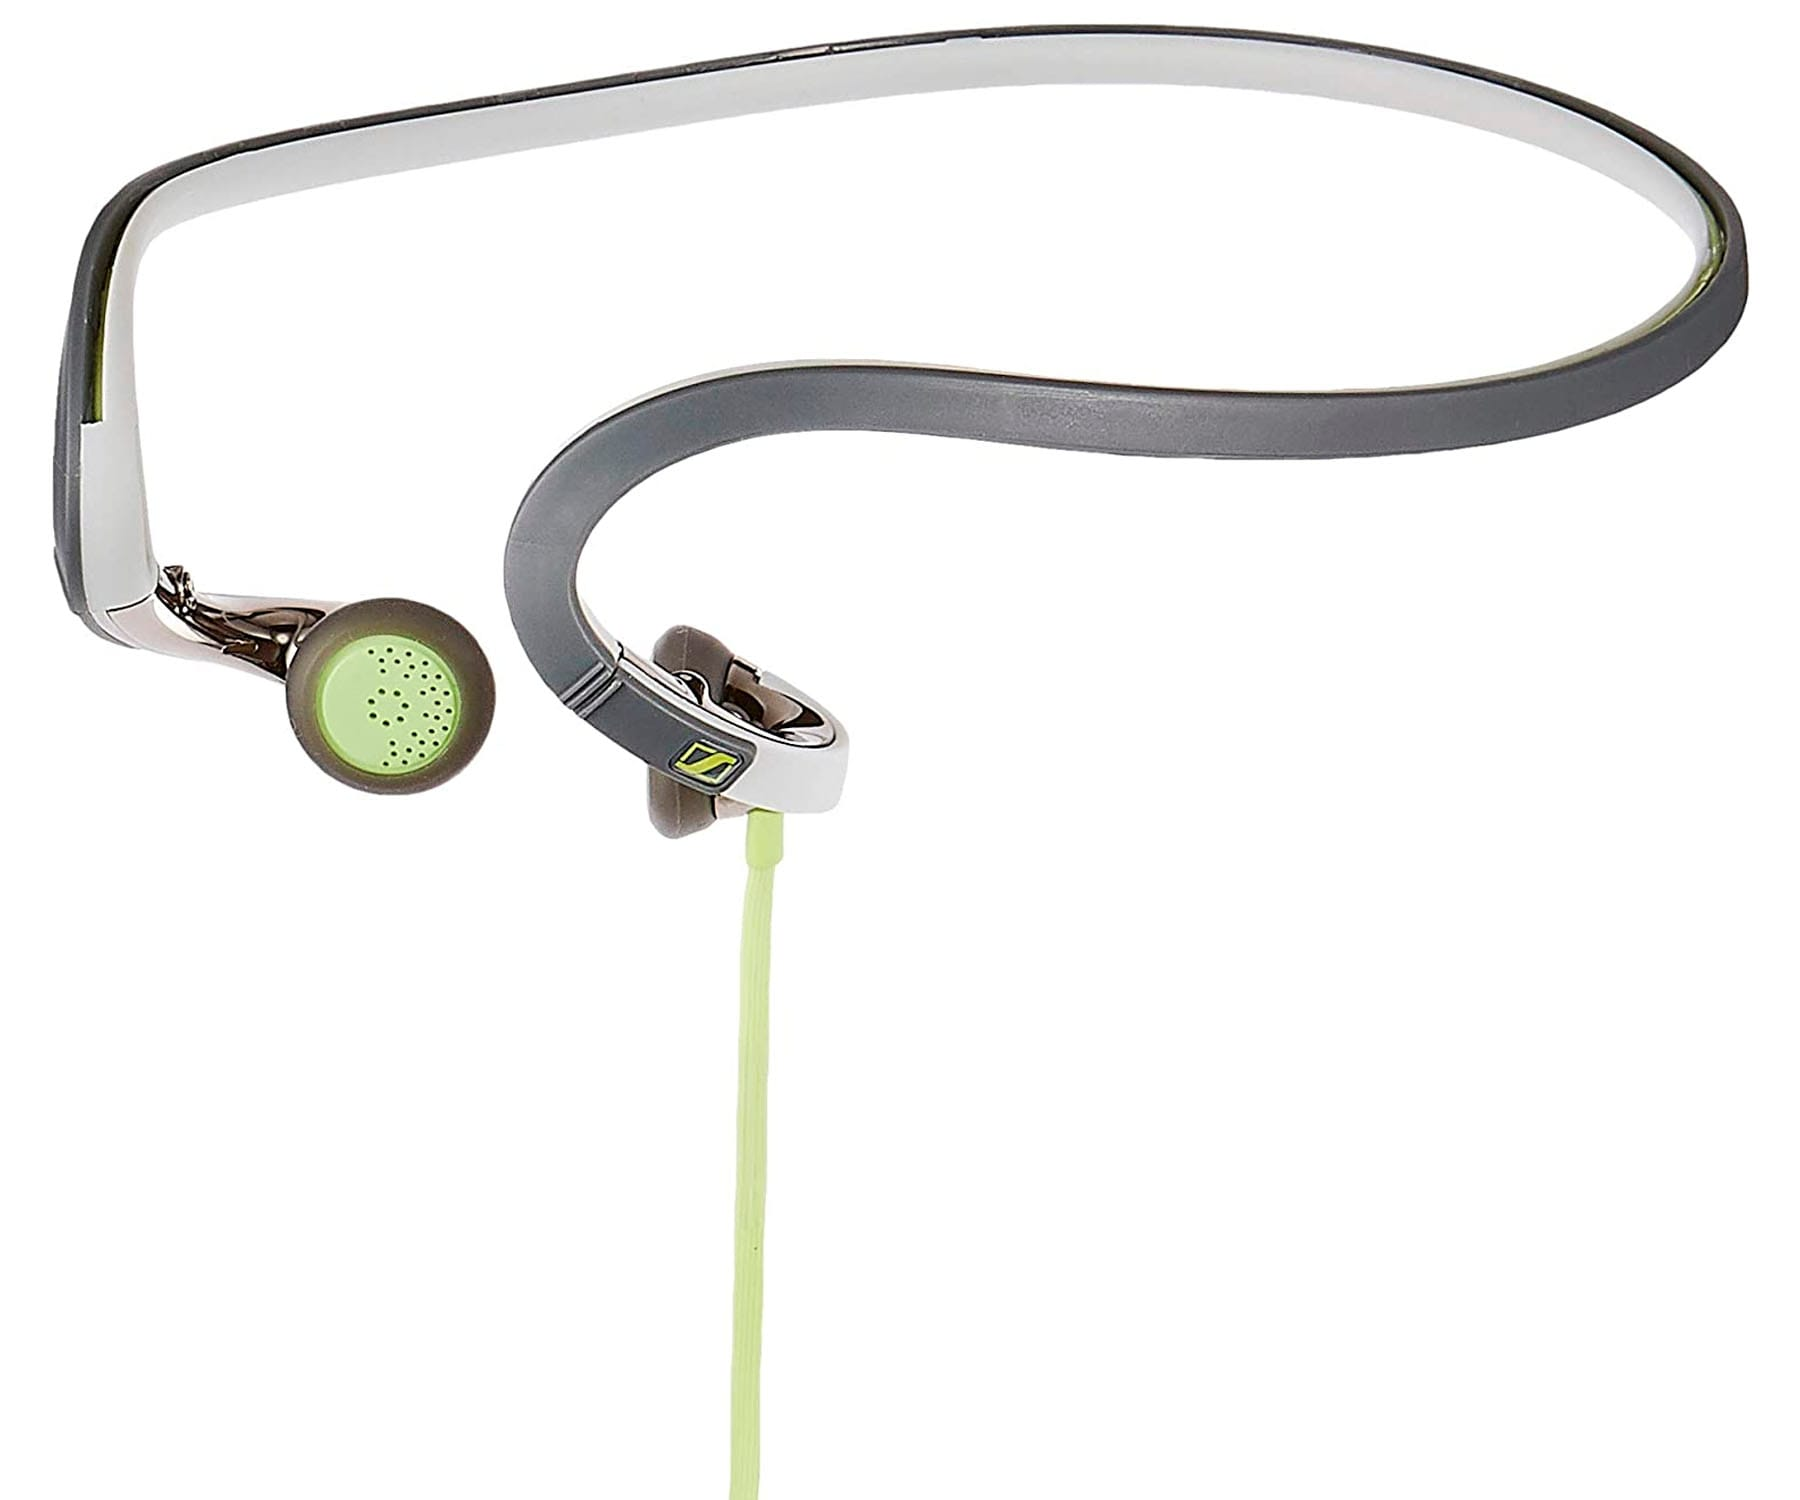 SENNHEISER PMX686G VERDE AURICULAR CUELLO SPORT IN-EAR CON MICRÓFONO CONTROL DE VOLUMEN JACK 3.5mm